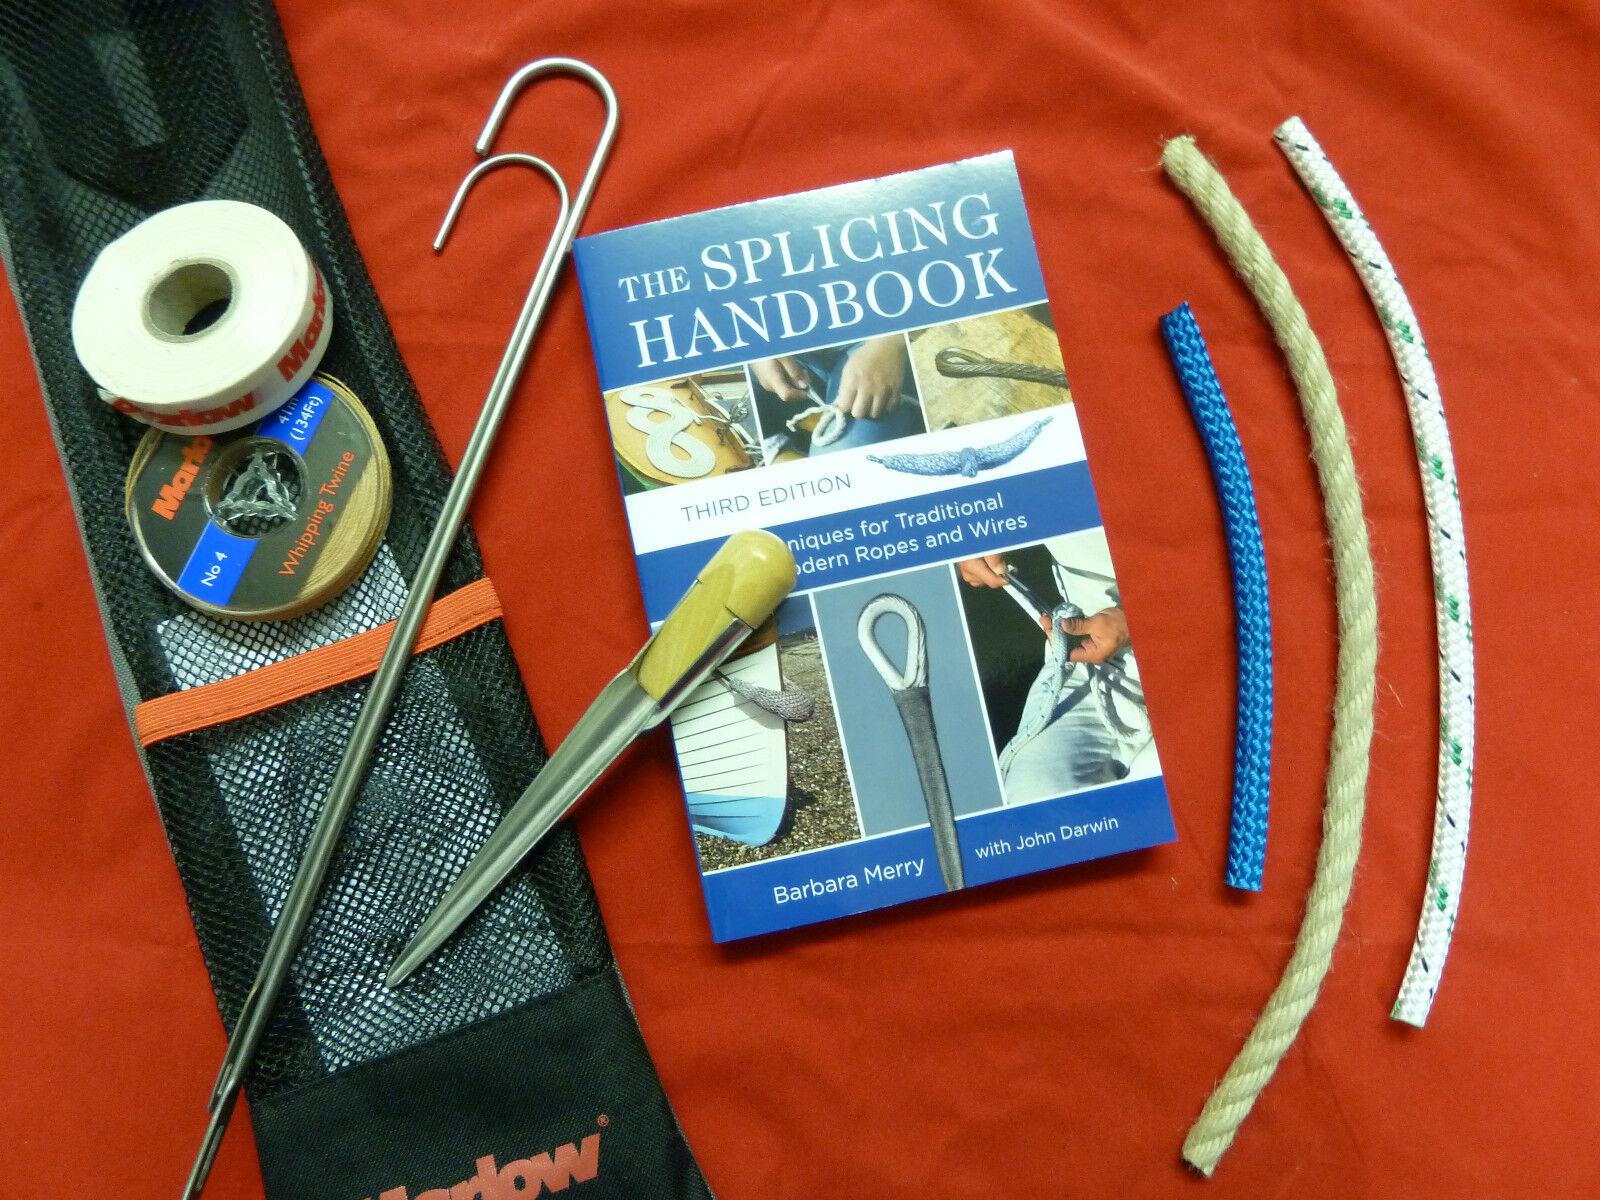 GIFT SET   Splicing kit, book and rope. Splicing handbook. Rope Gift.